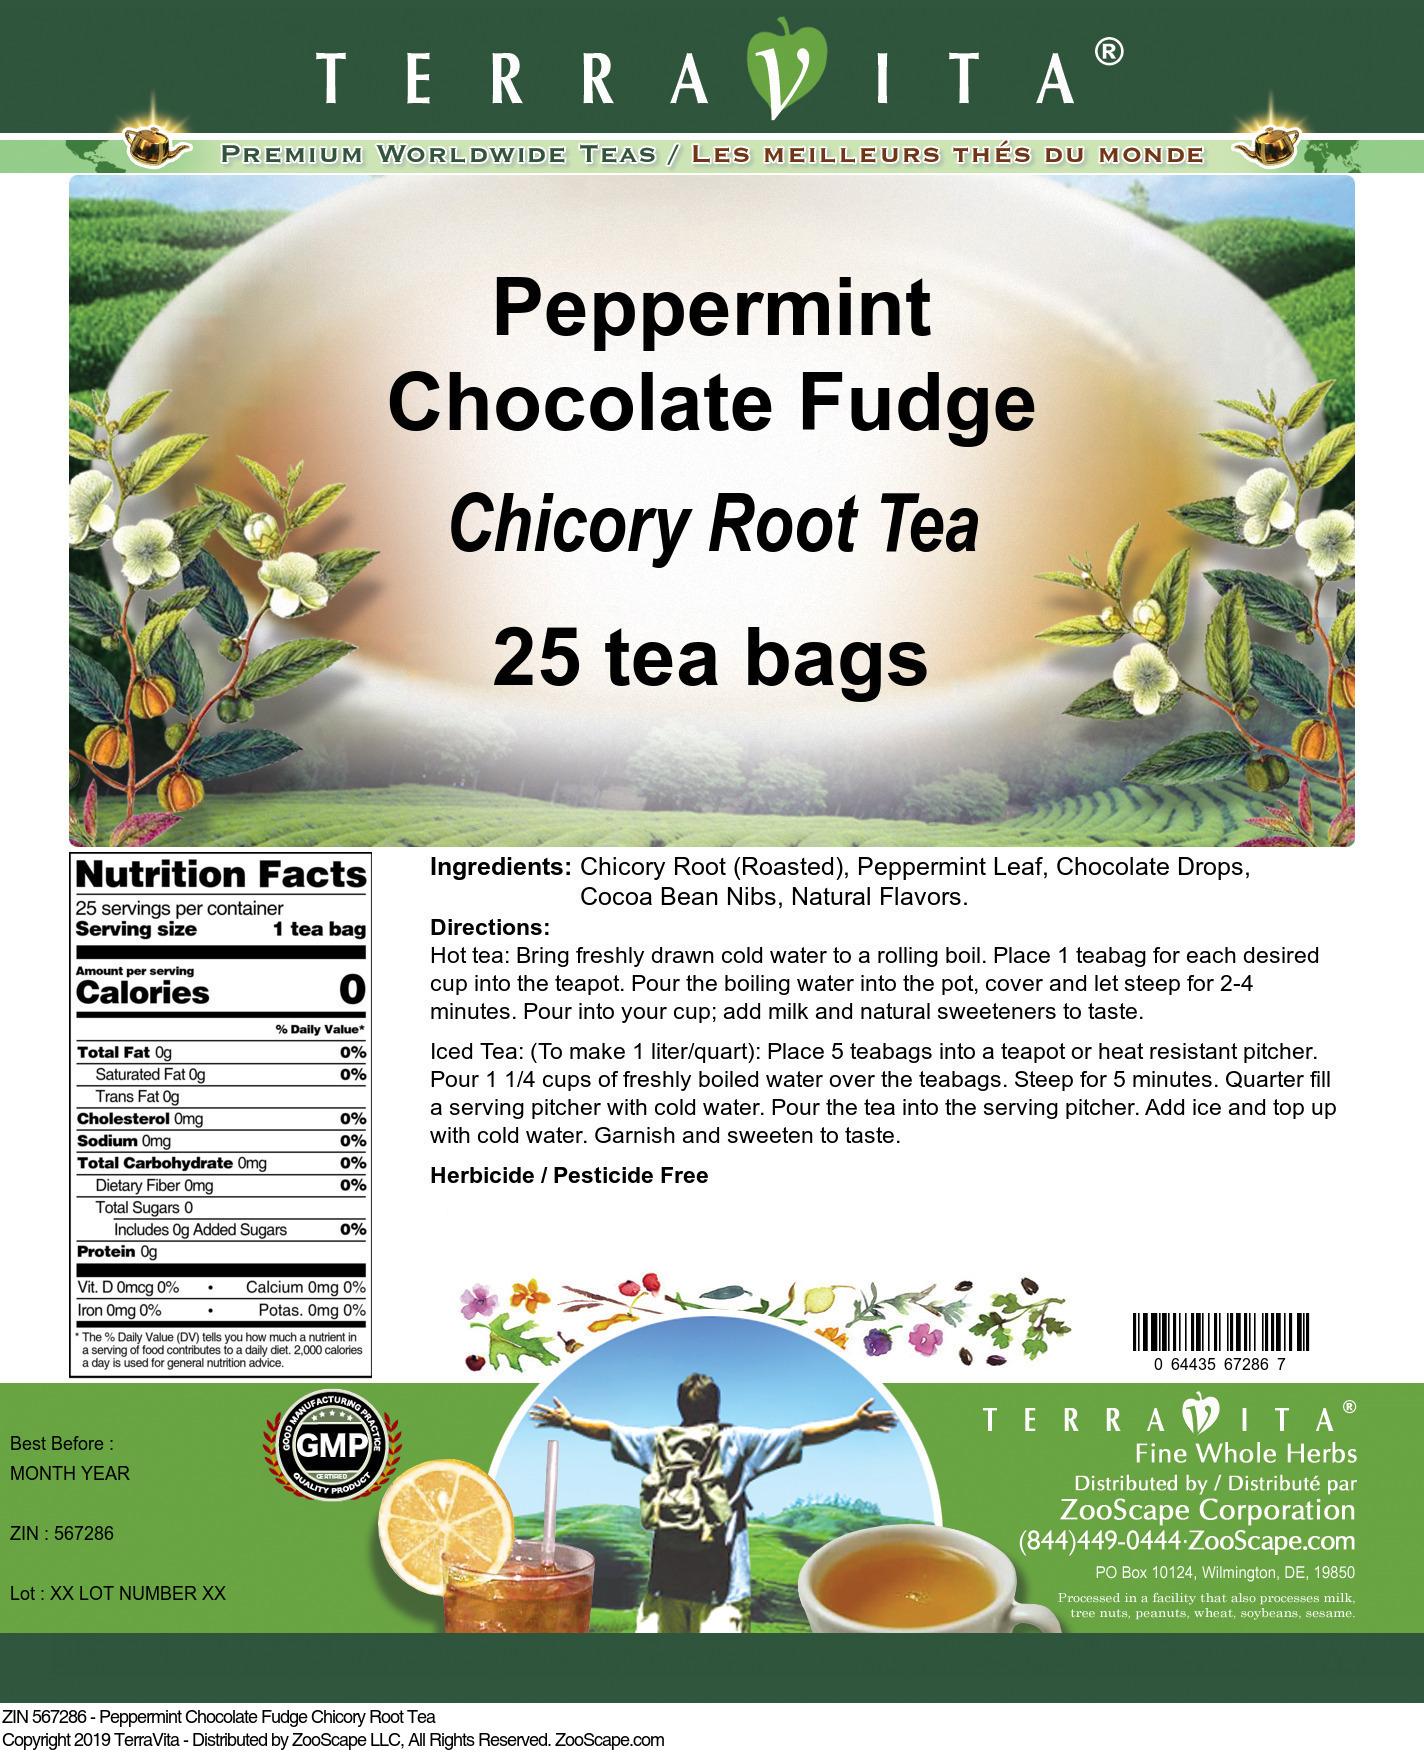 Peppermint Chocolate Fudge Chicory Root Tea